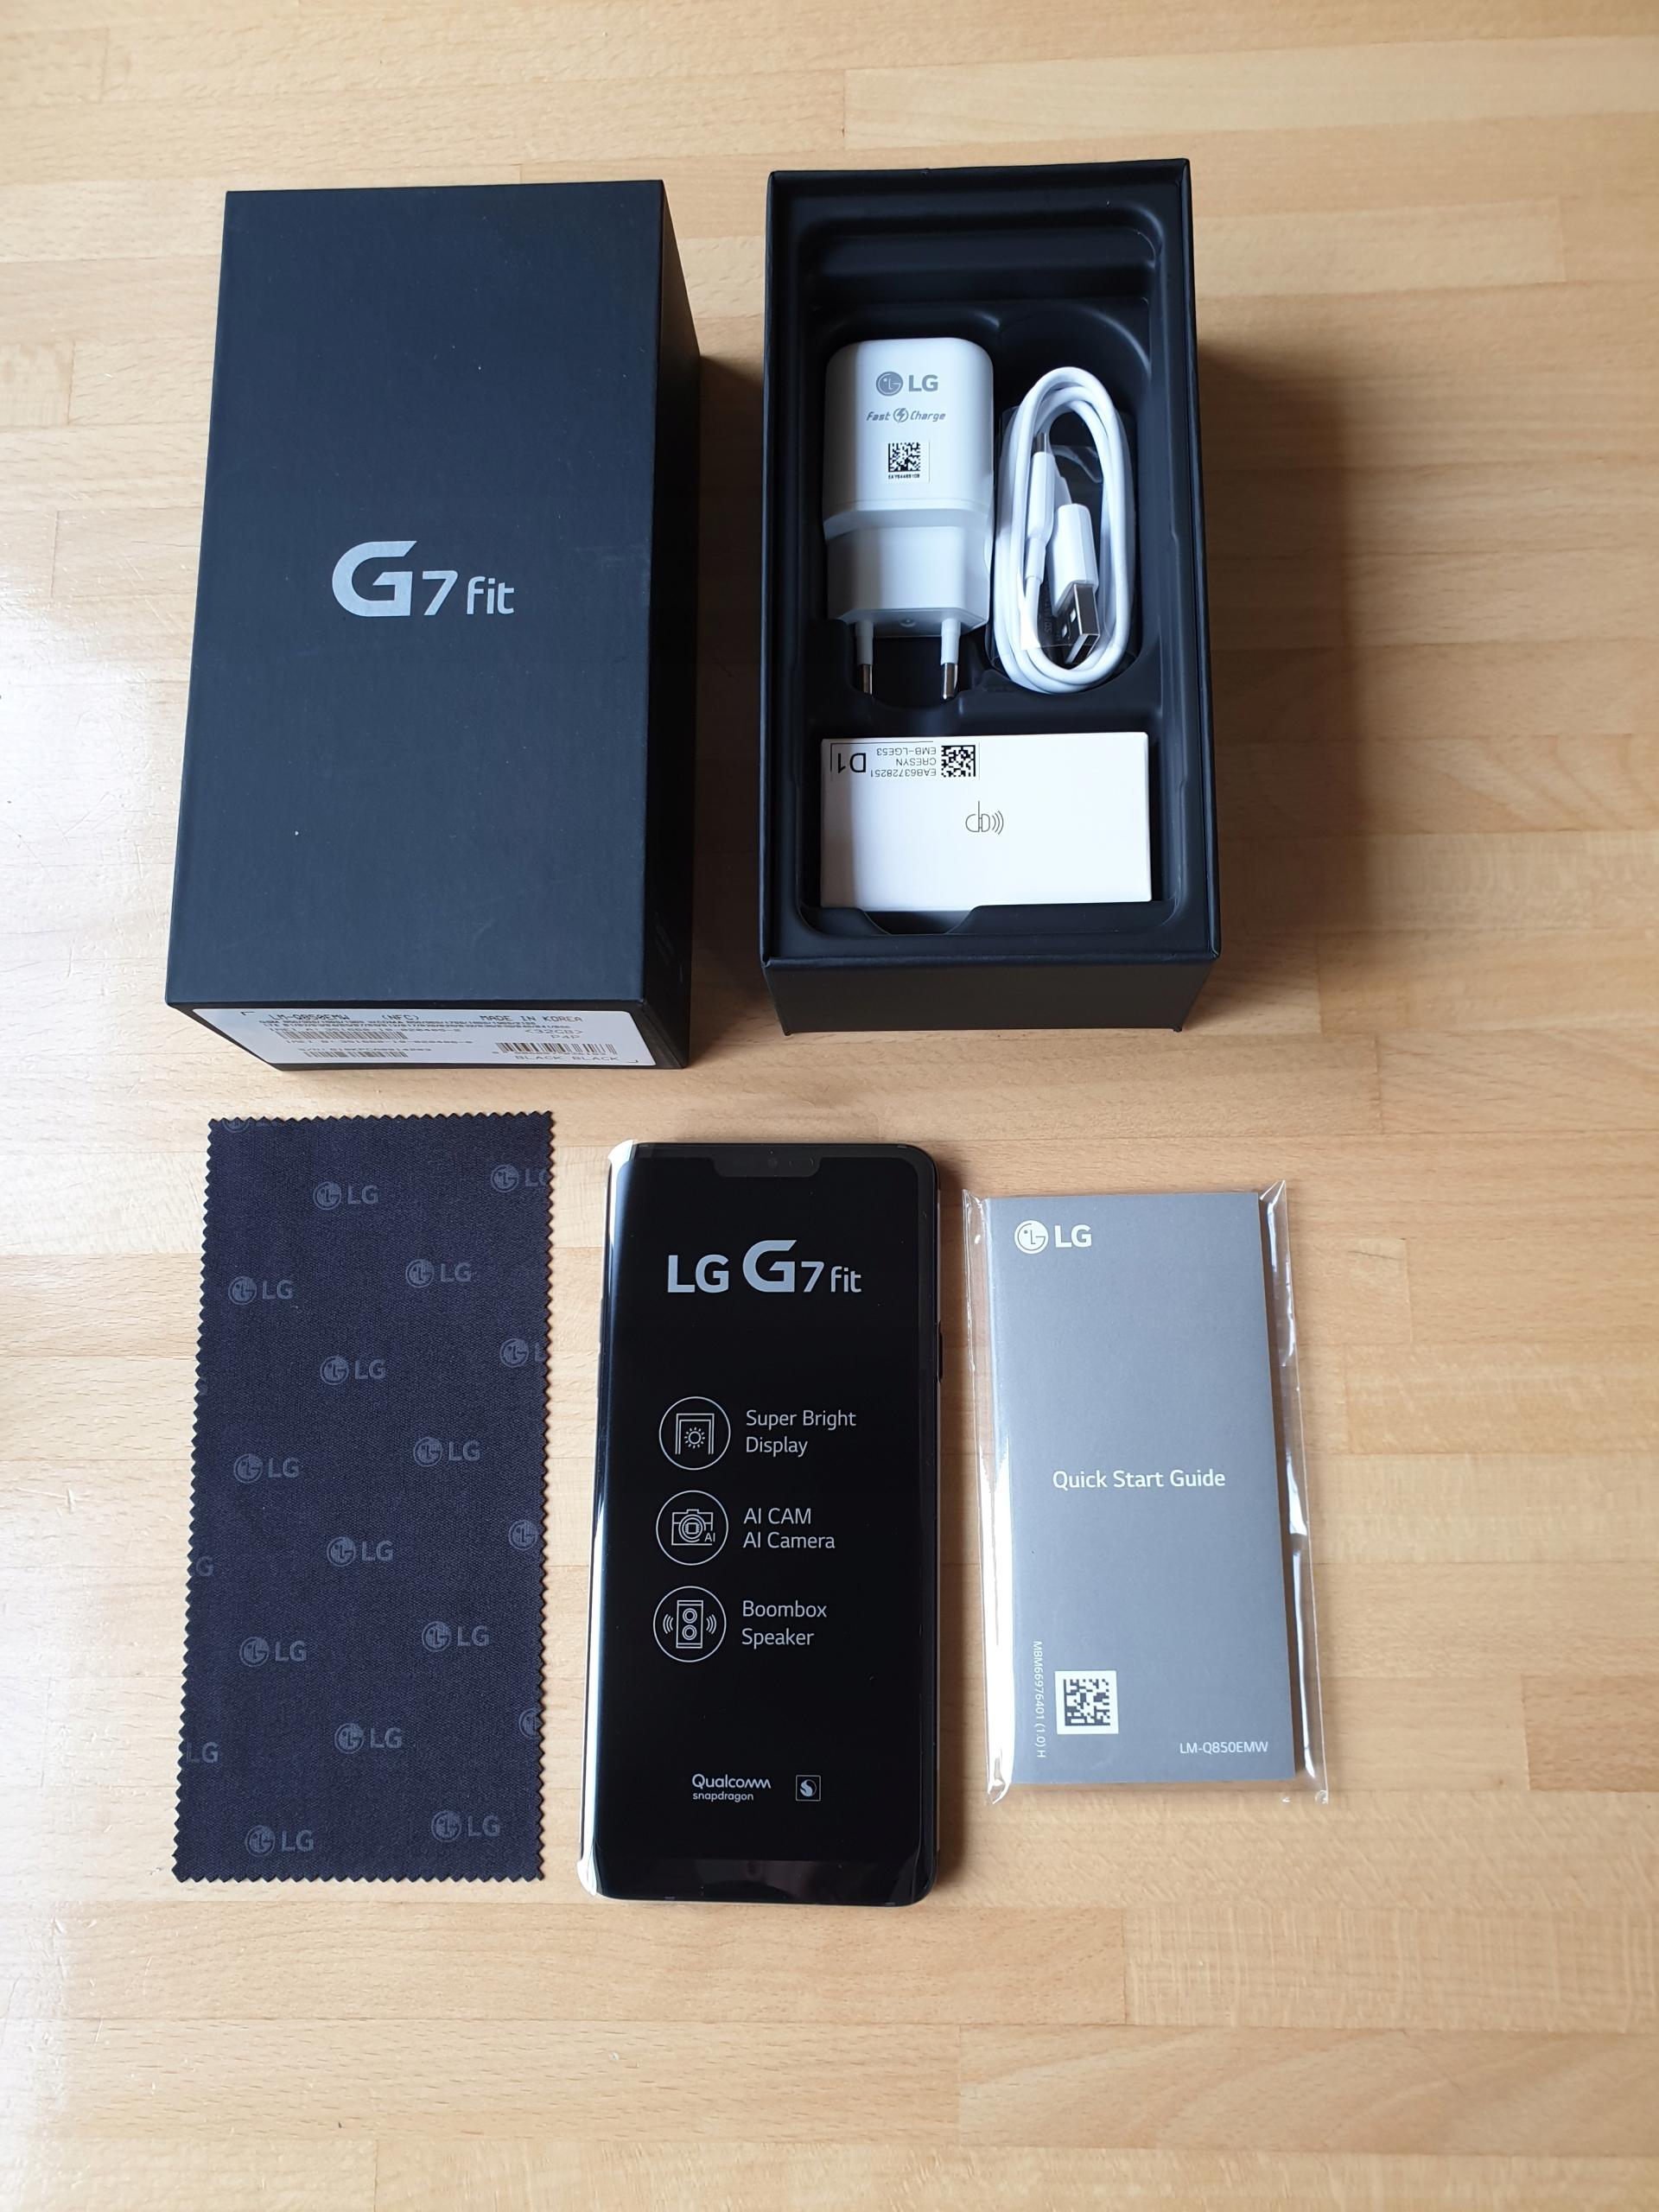 LG G7 FIT NOWE